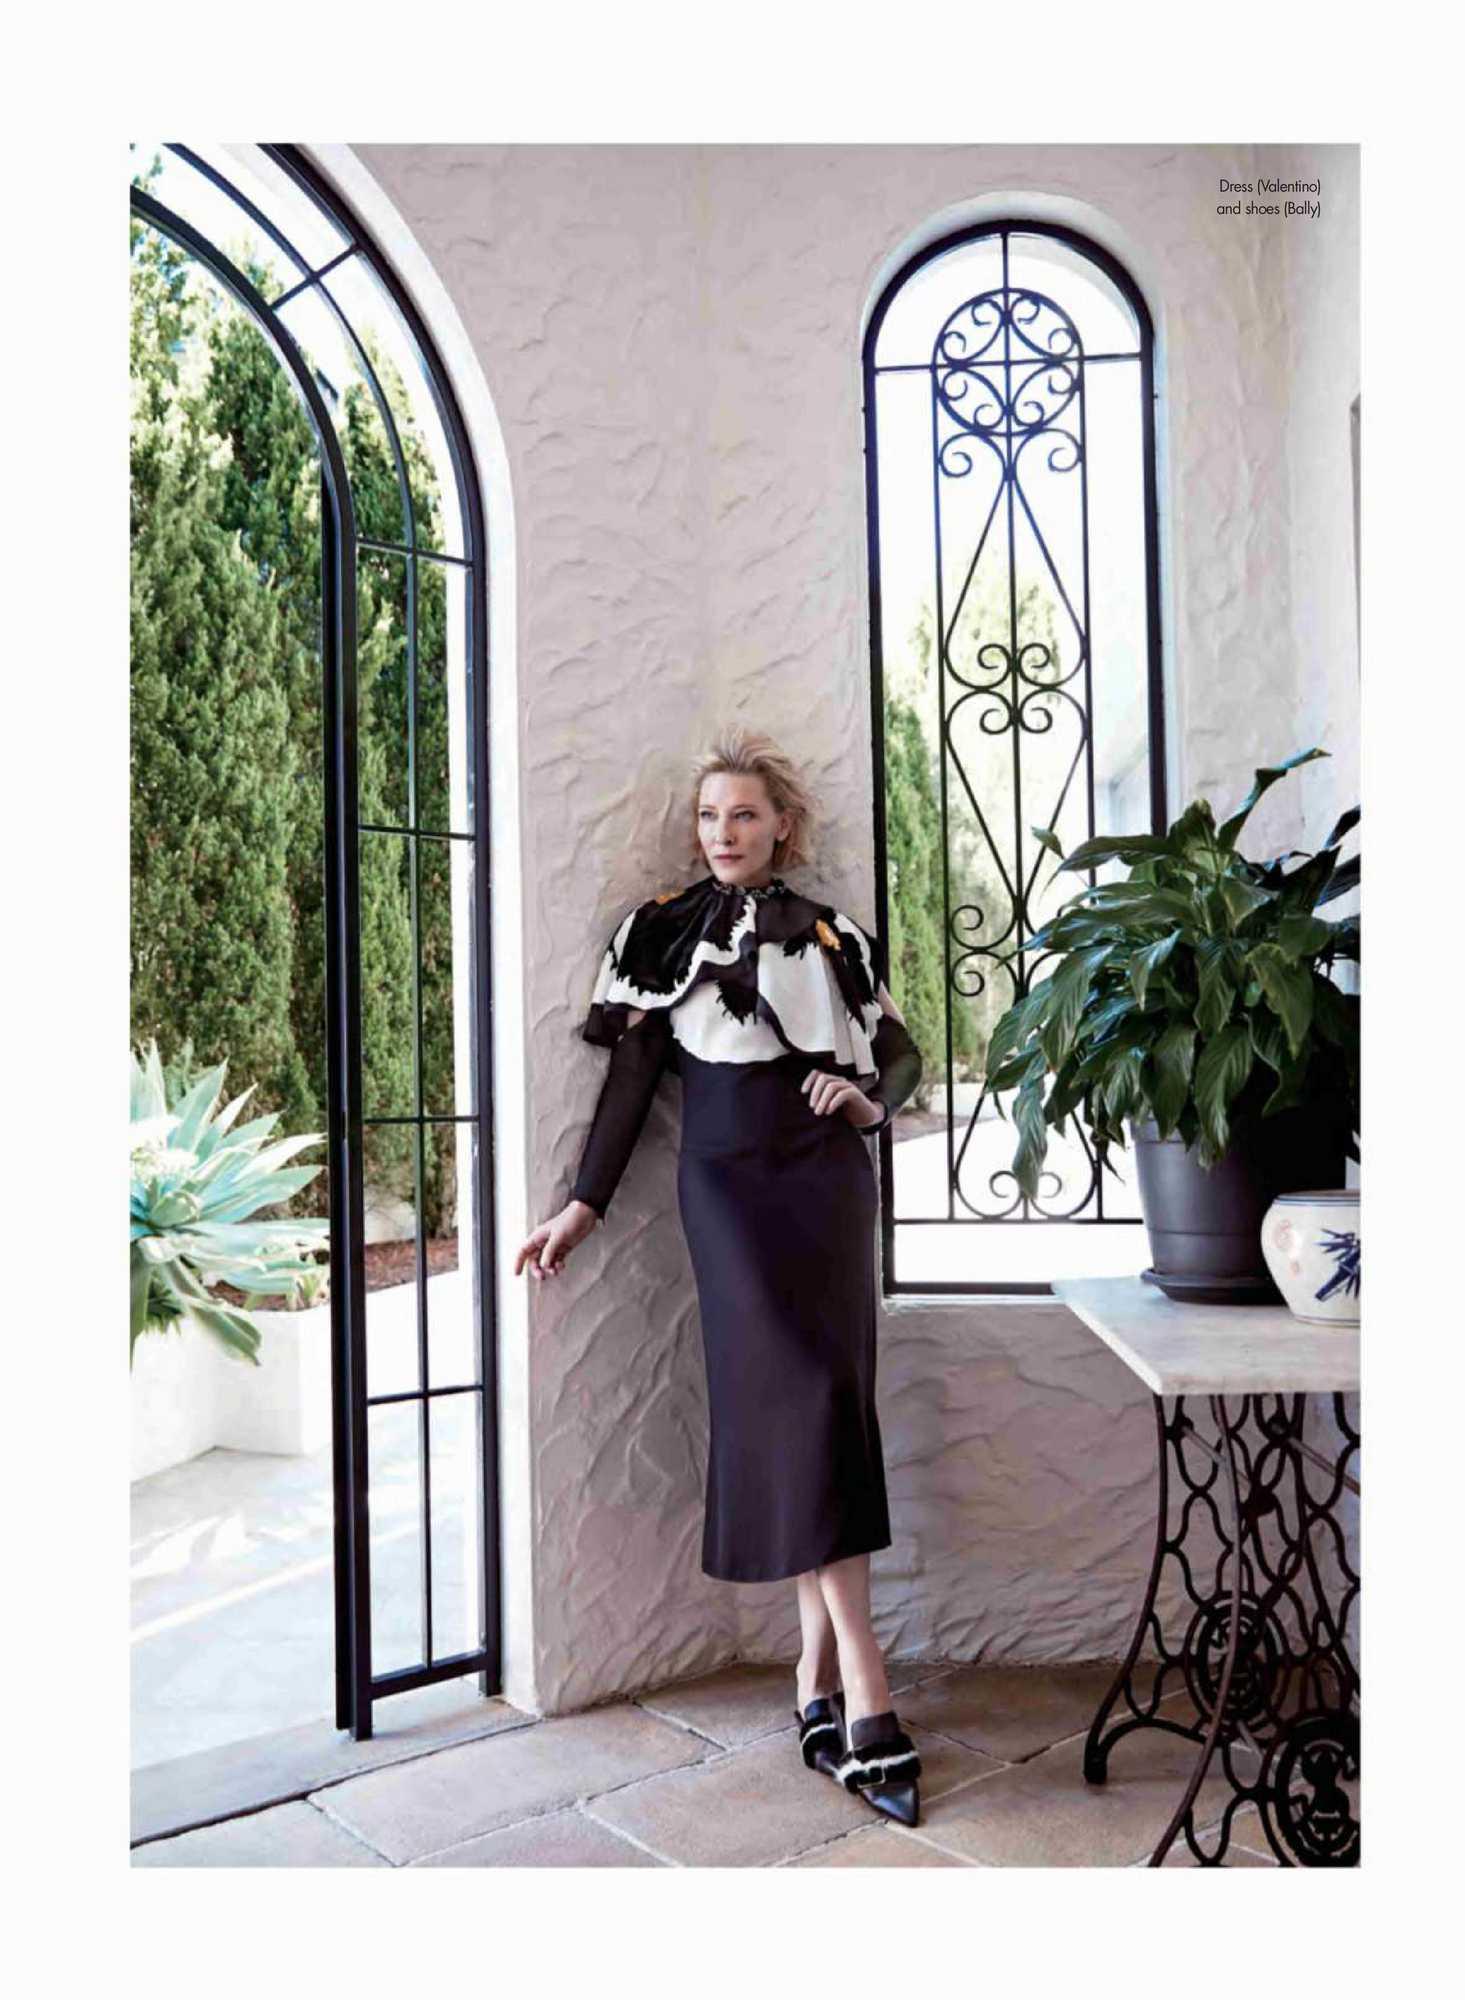 Cate-Blanchett-Elle-Canada-December-20188762f91024005934.jpg